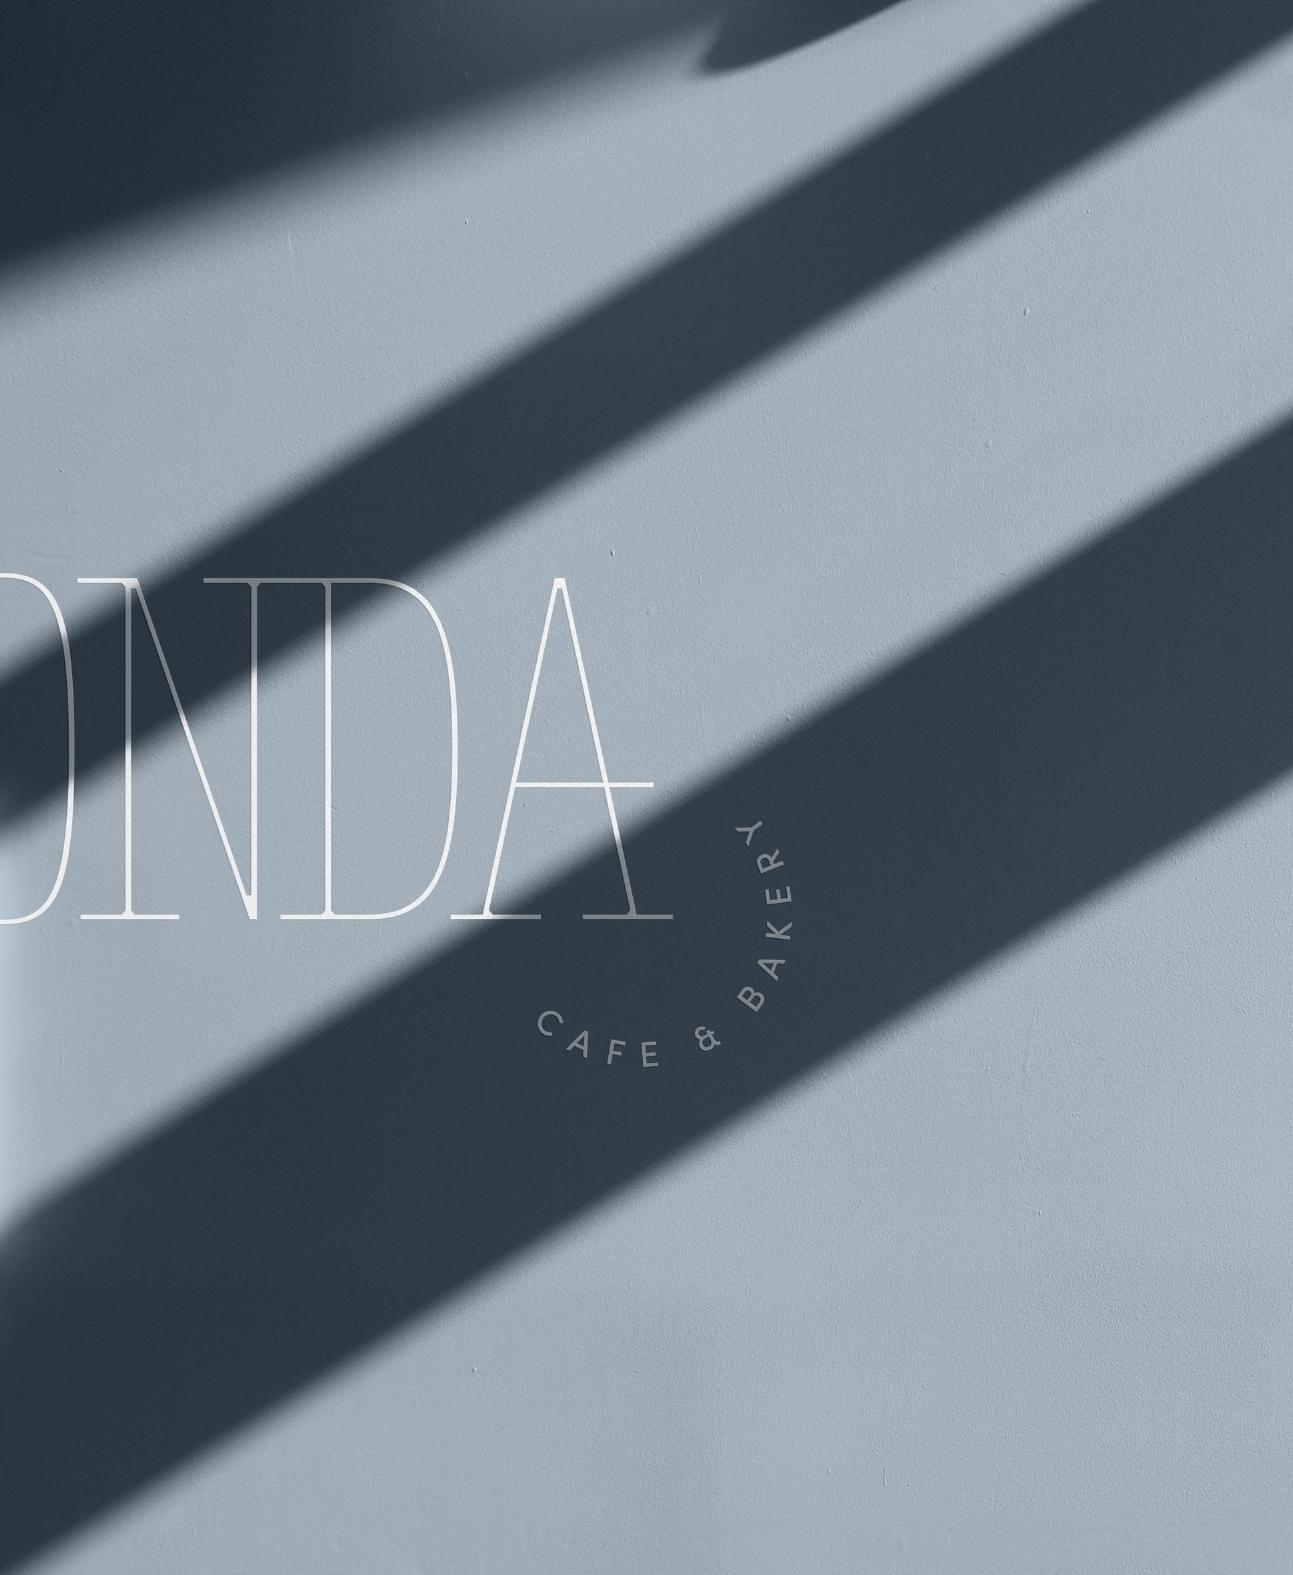 Onda_wall.jpg